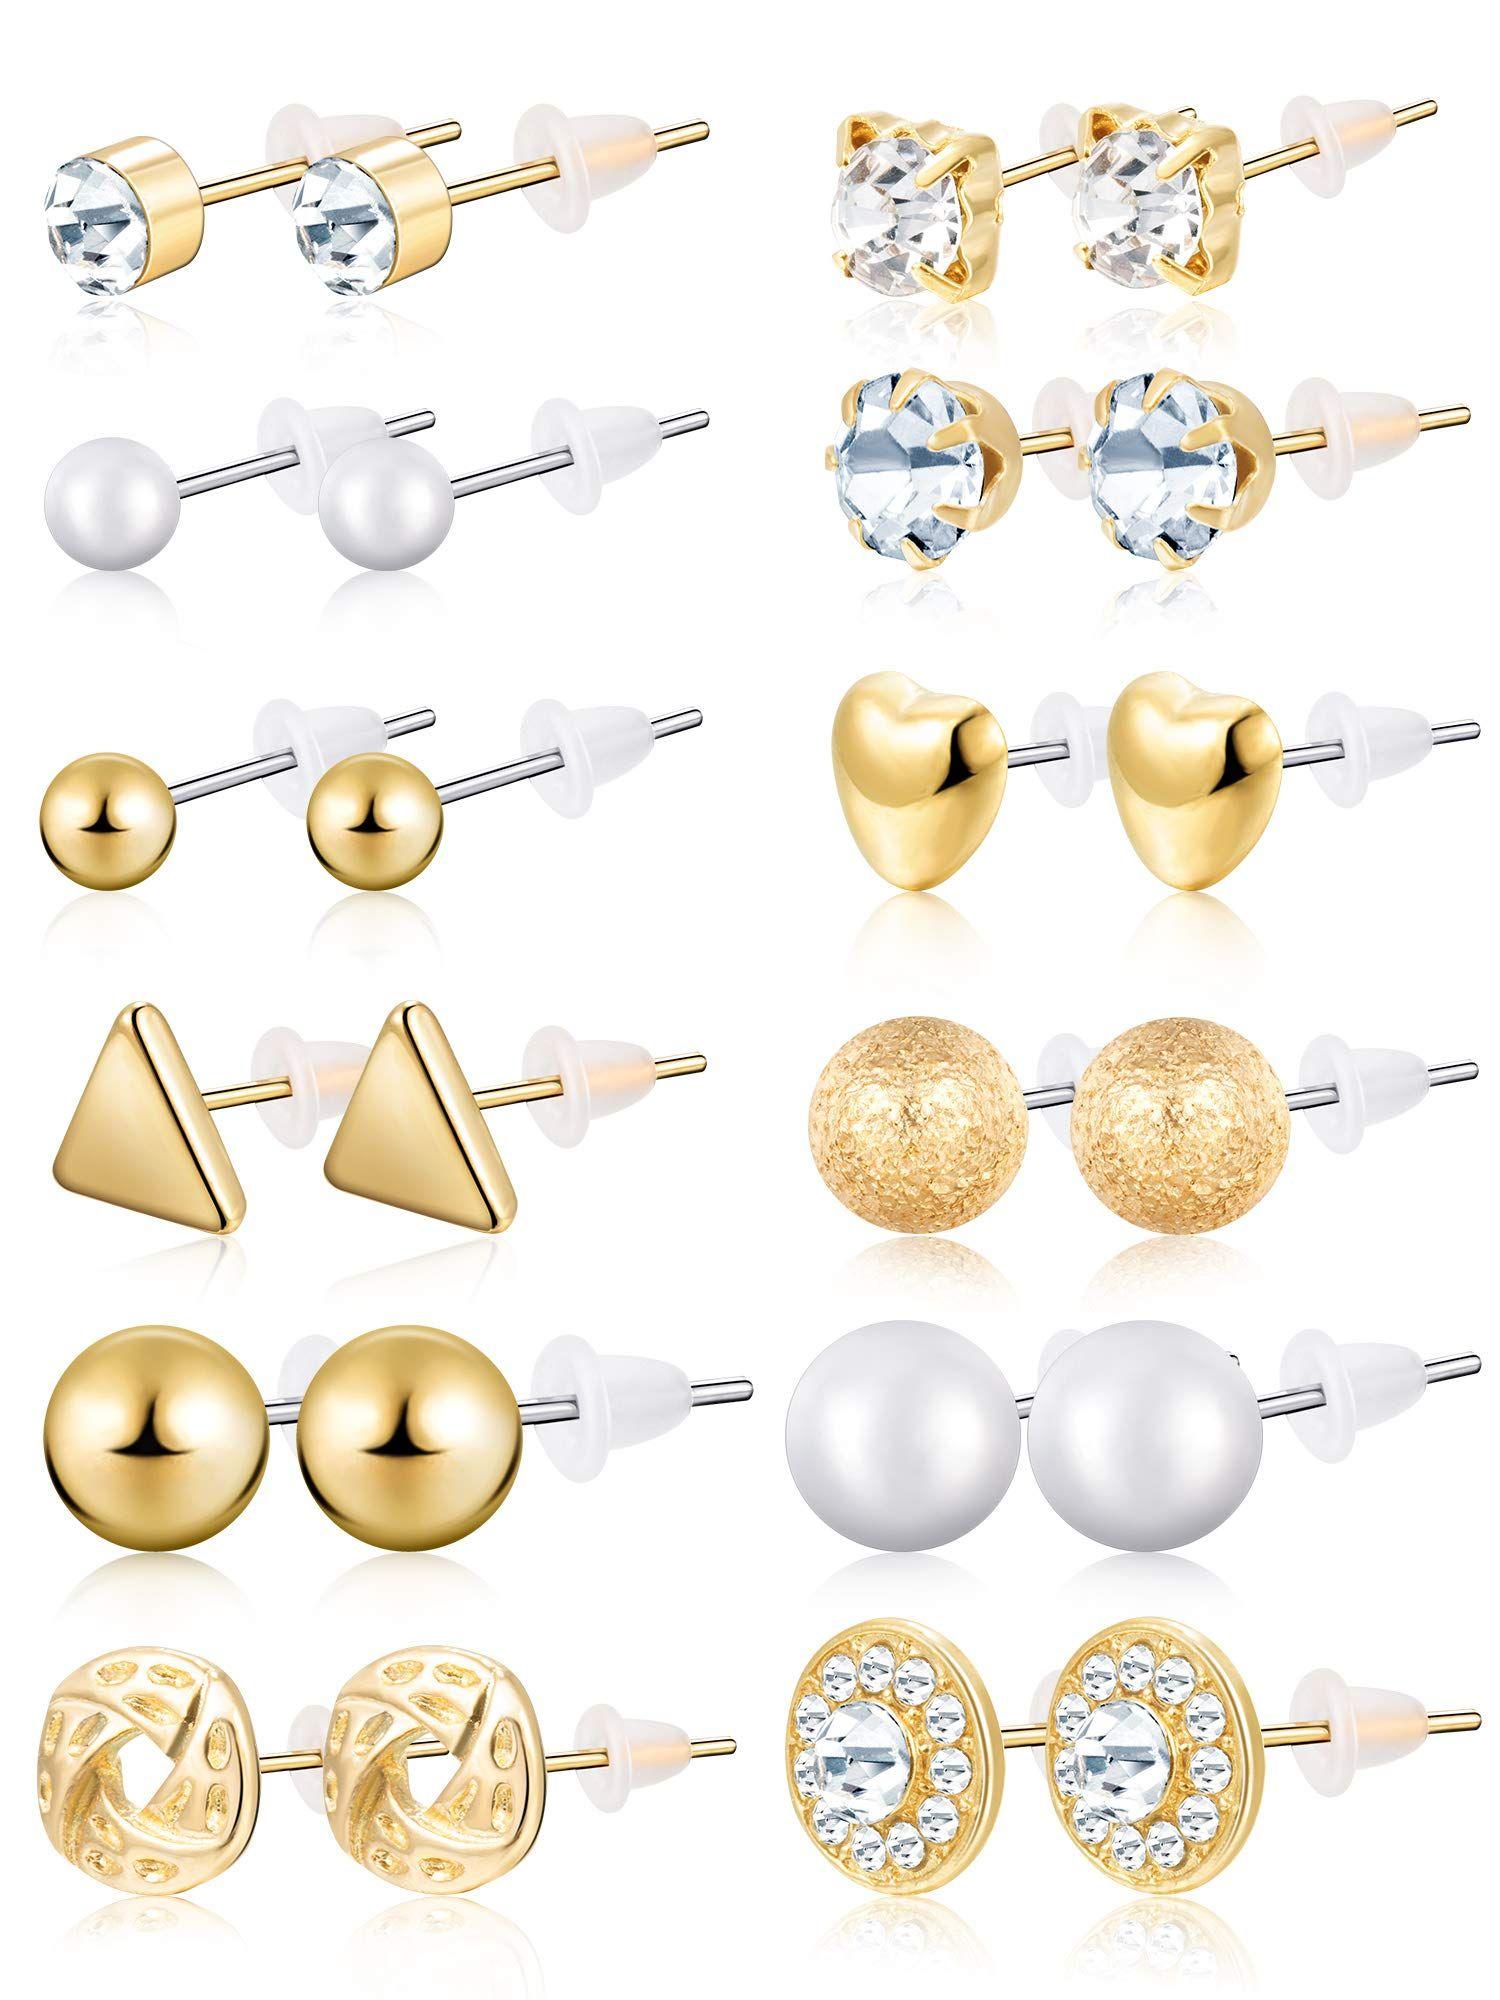 70c610b3c0a2b BBTO 24 Pairs Stud Earrings Crystal Pearl Earring Set Ear Stud ...